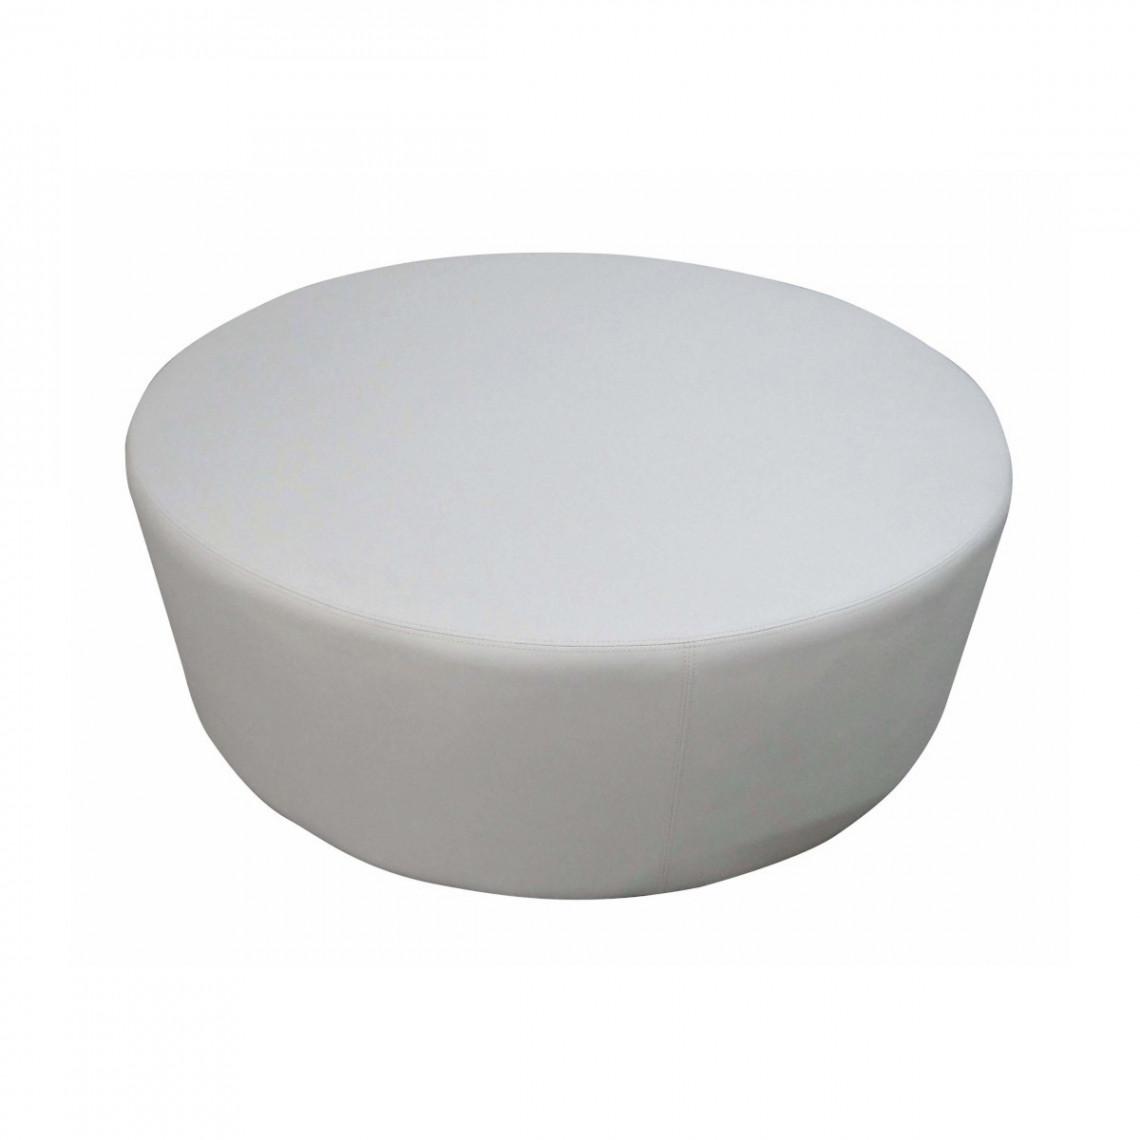 Pouf Cosy rond simili cuir blanc (Ø120 cm)